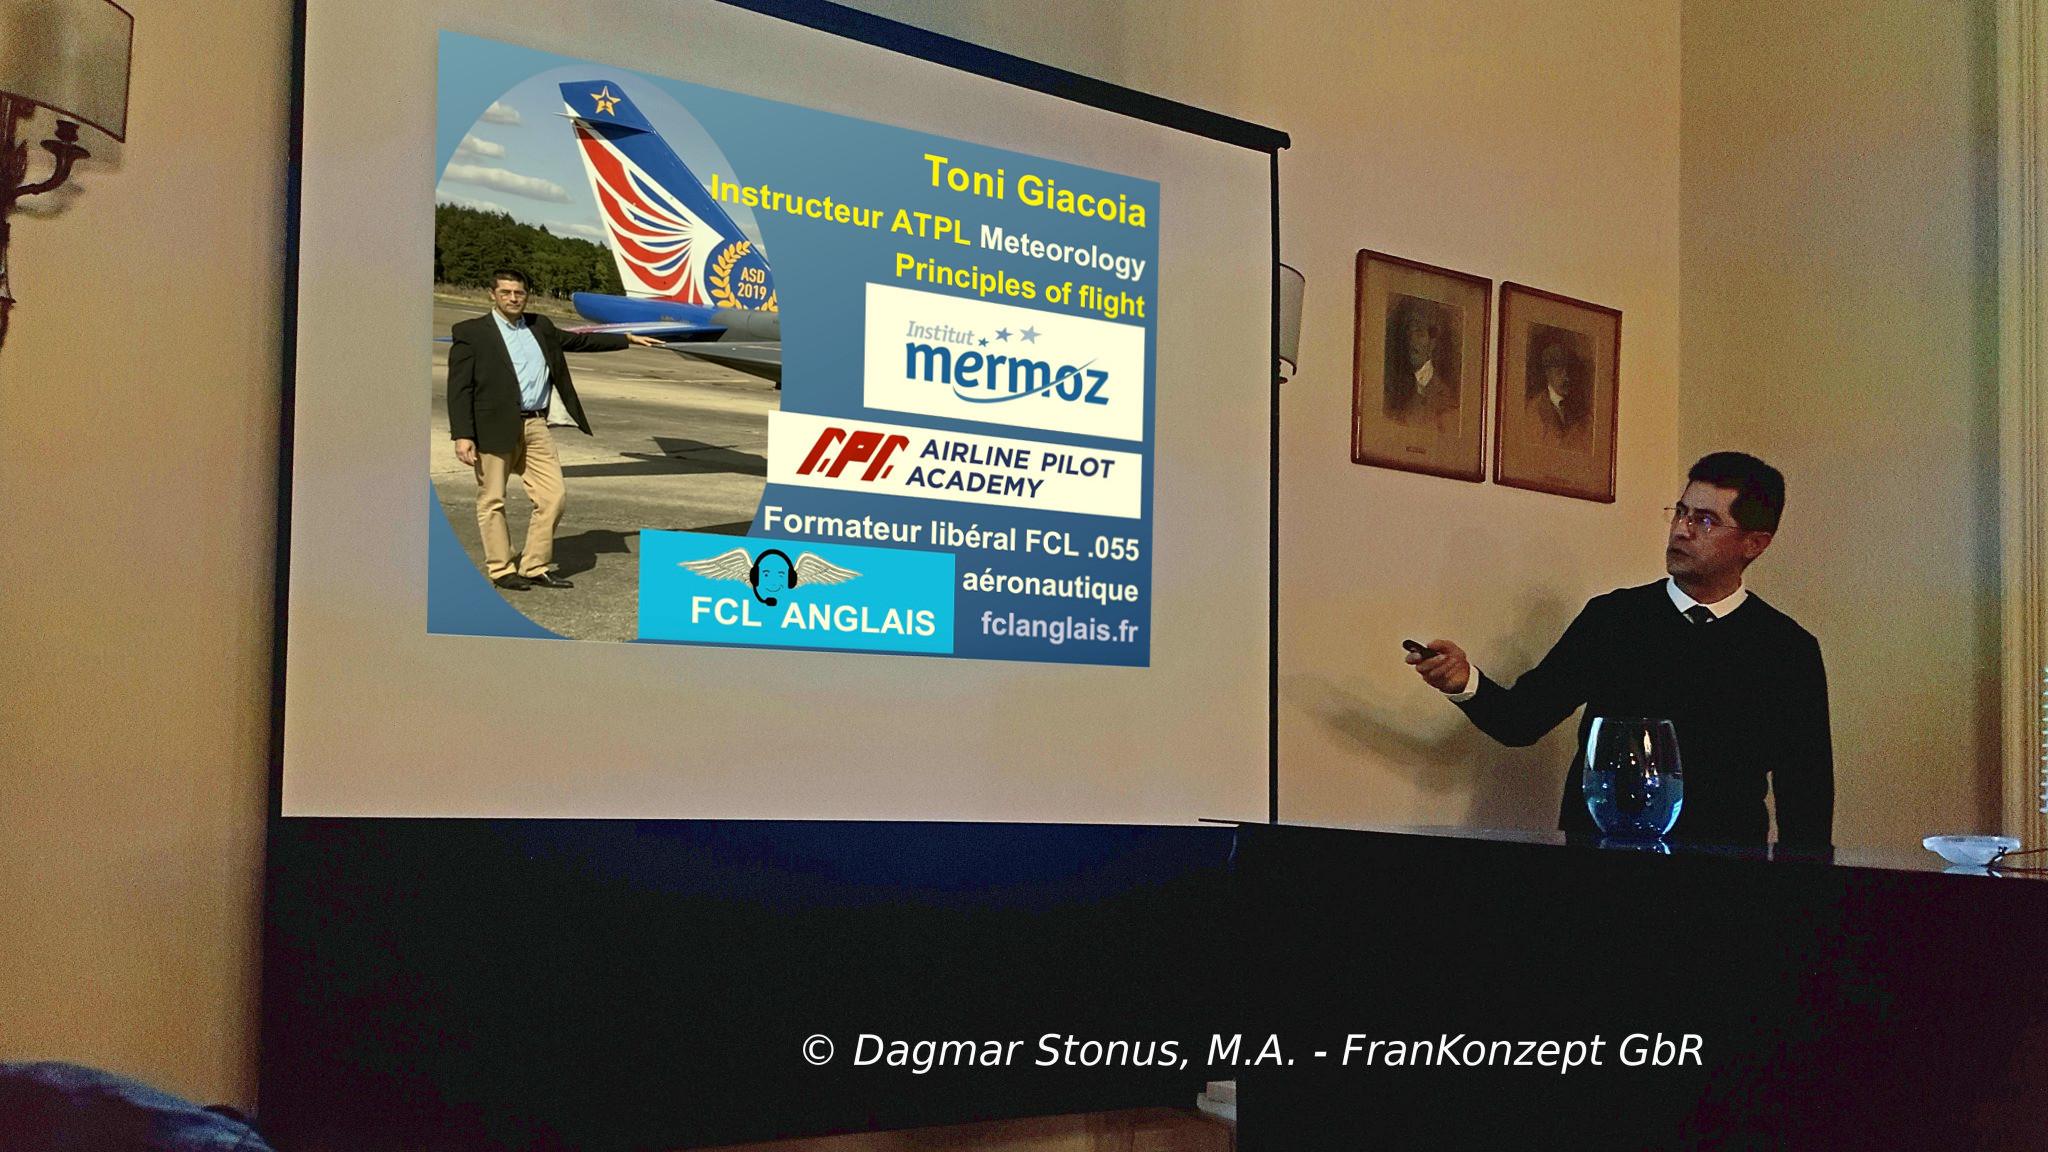 Toni Giacoia conference Aeroclub de France Gustav Weisskopf Gustave Whitehead Dagmar Stonus Frankonzept GbR Institut Mermoz APA Training FCL Anglais